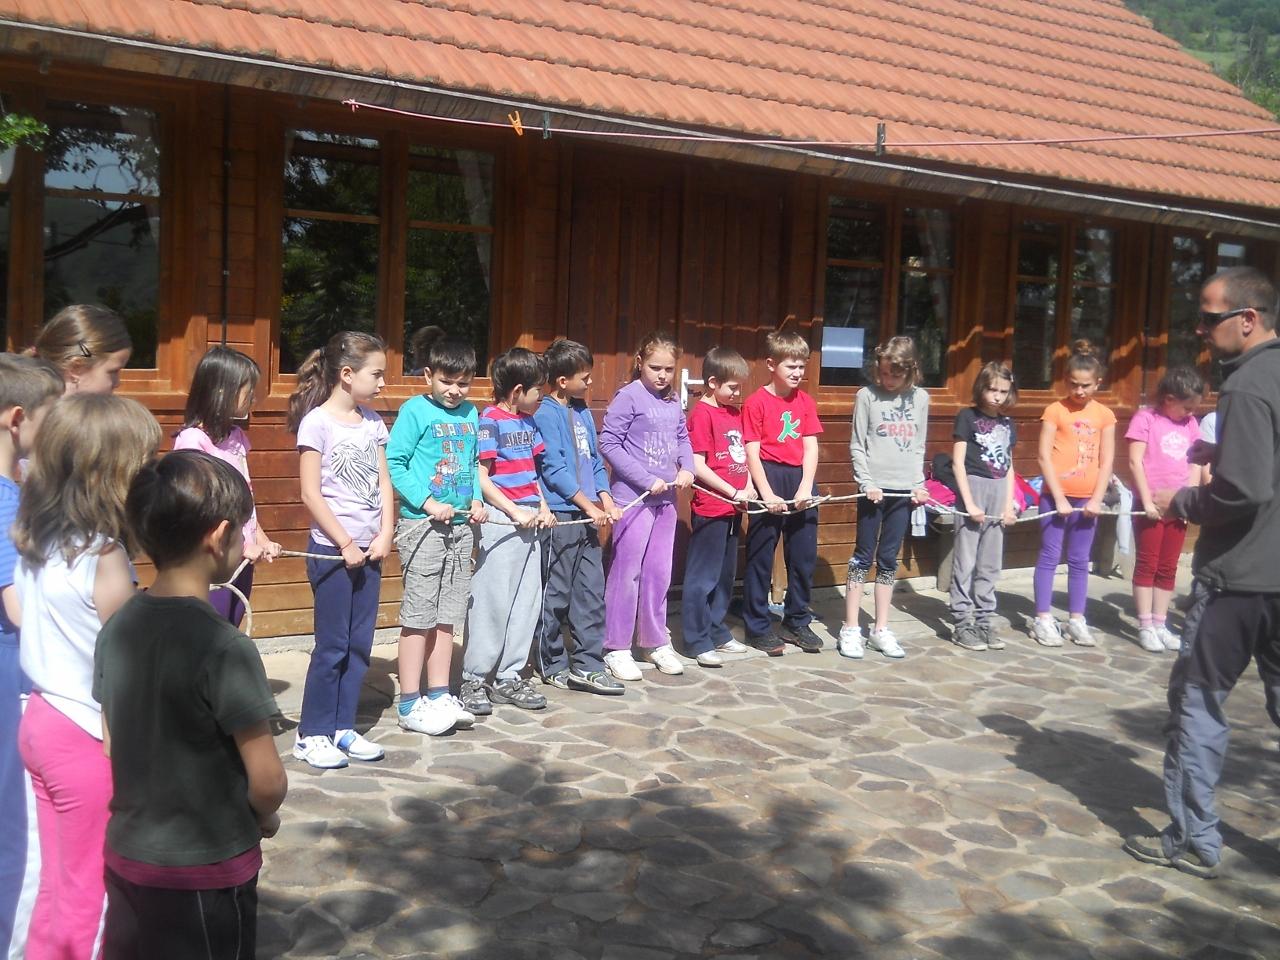 erdei_iskola3 (1280x960)